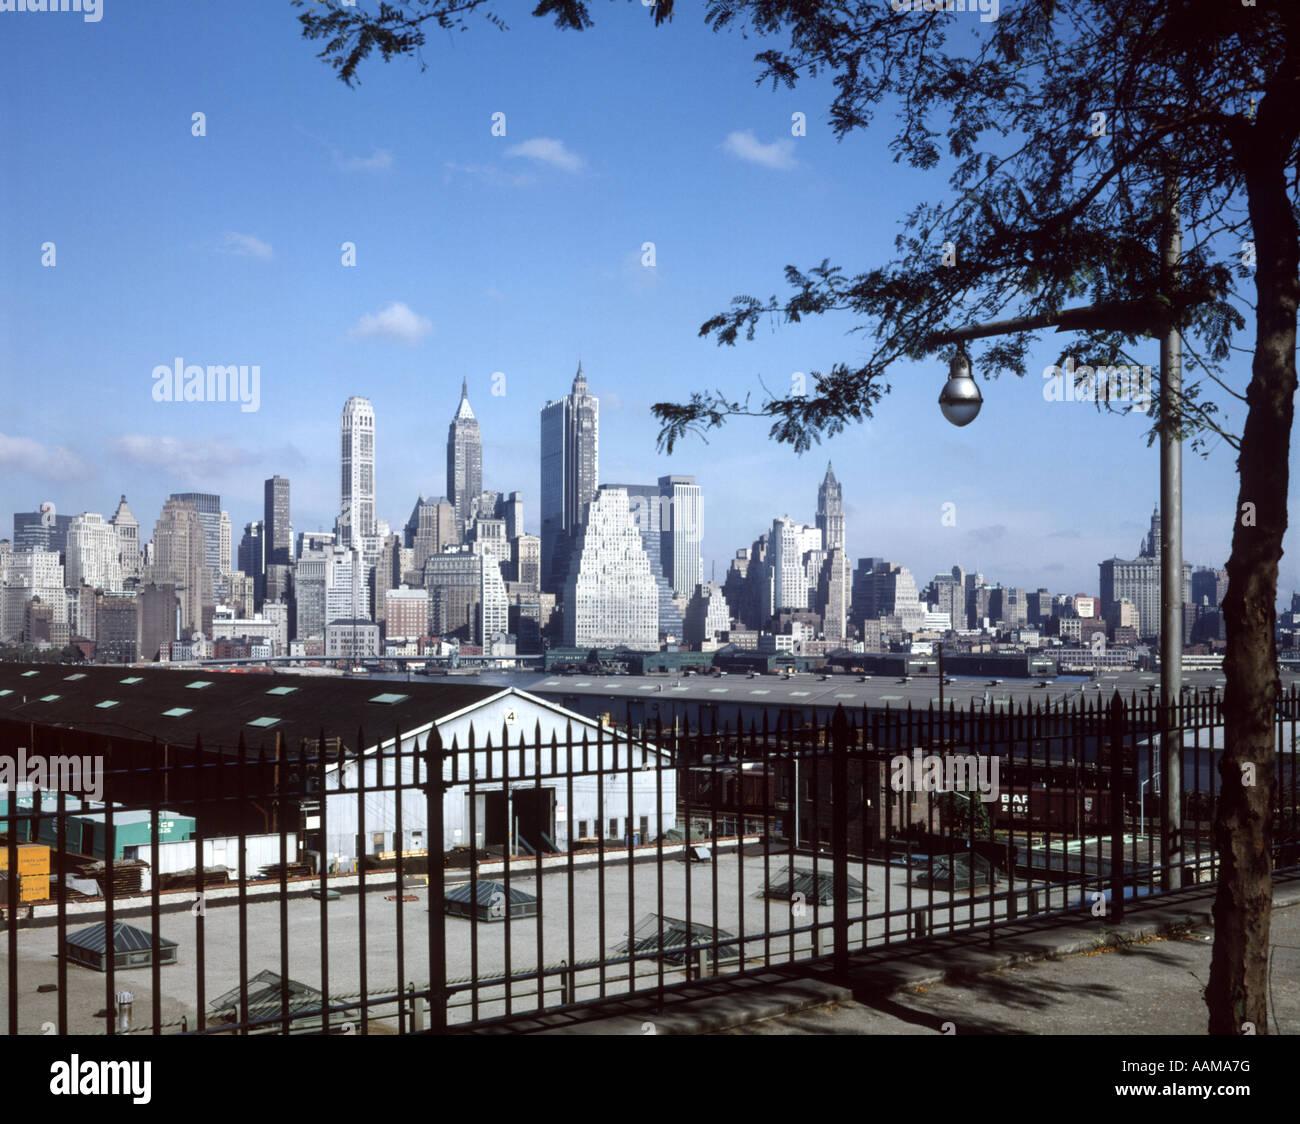 1960 1960 NEW YORK CITY MANHATTAN SKYLINE DOWNTOWN DE BROOKLYN HEIGHTS Photo Stock